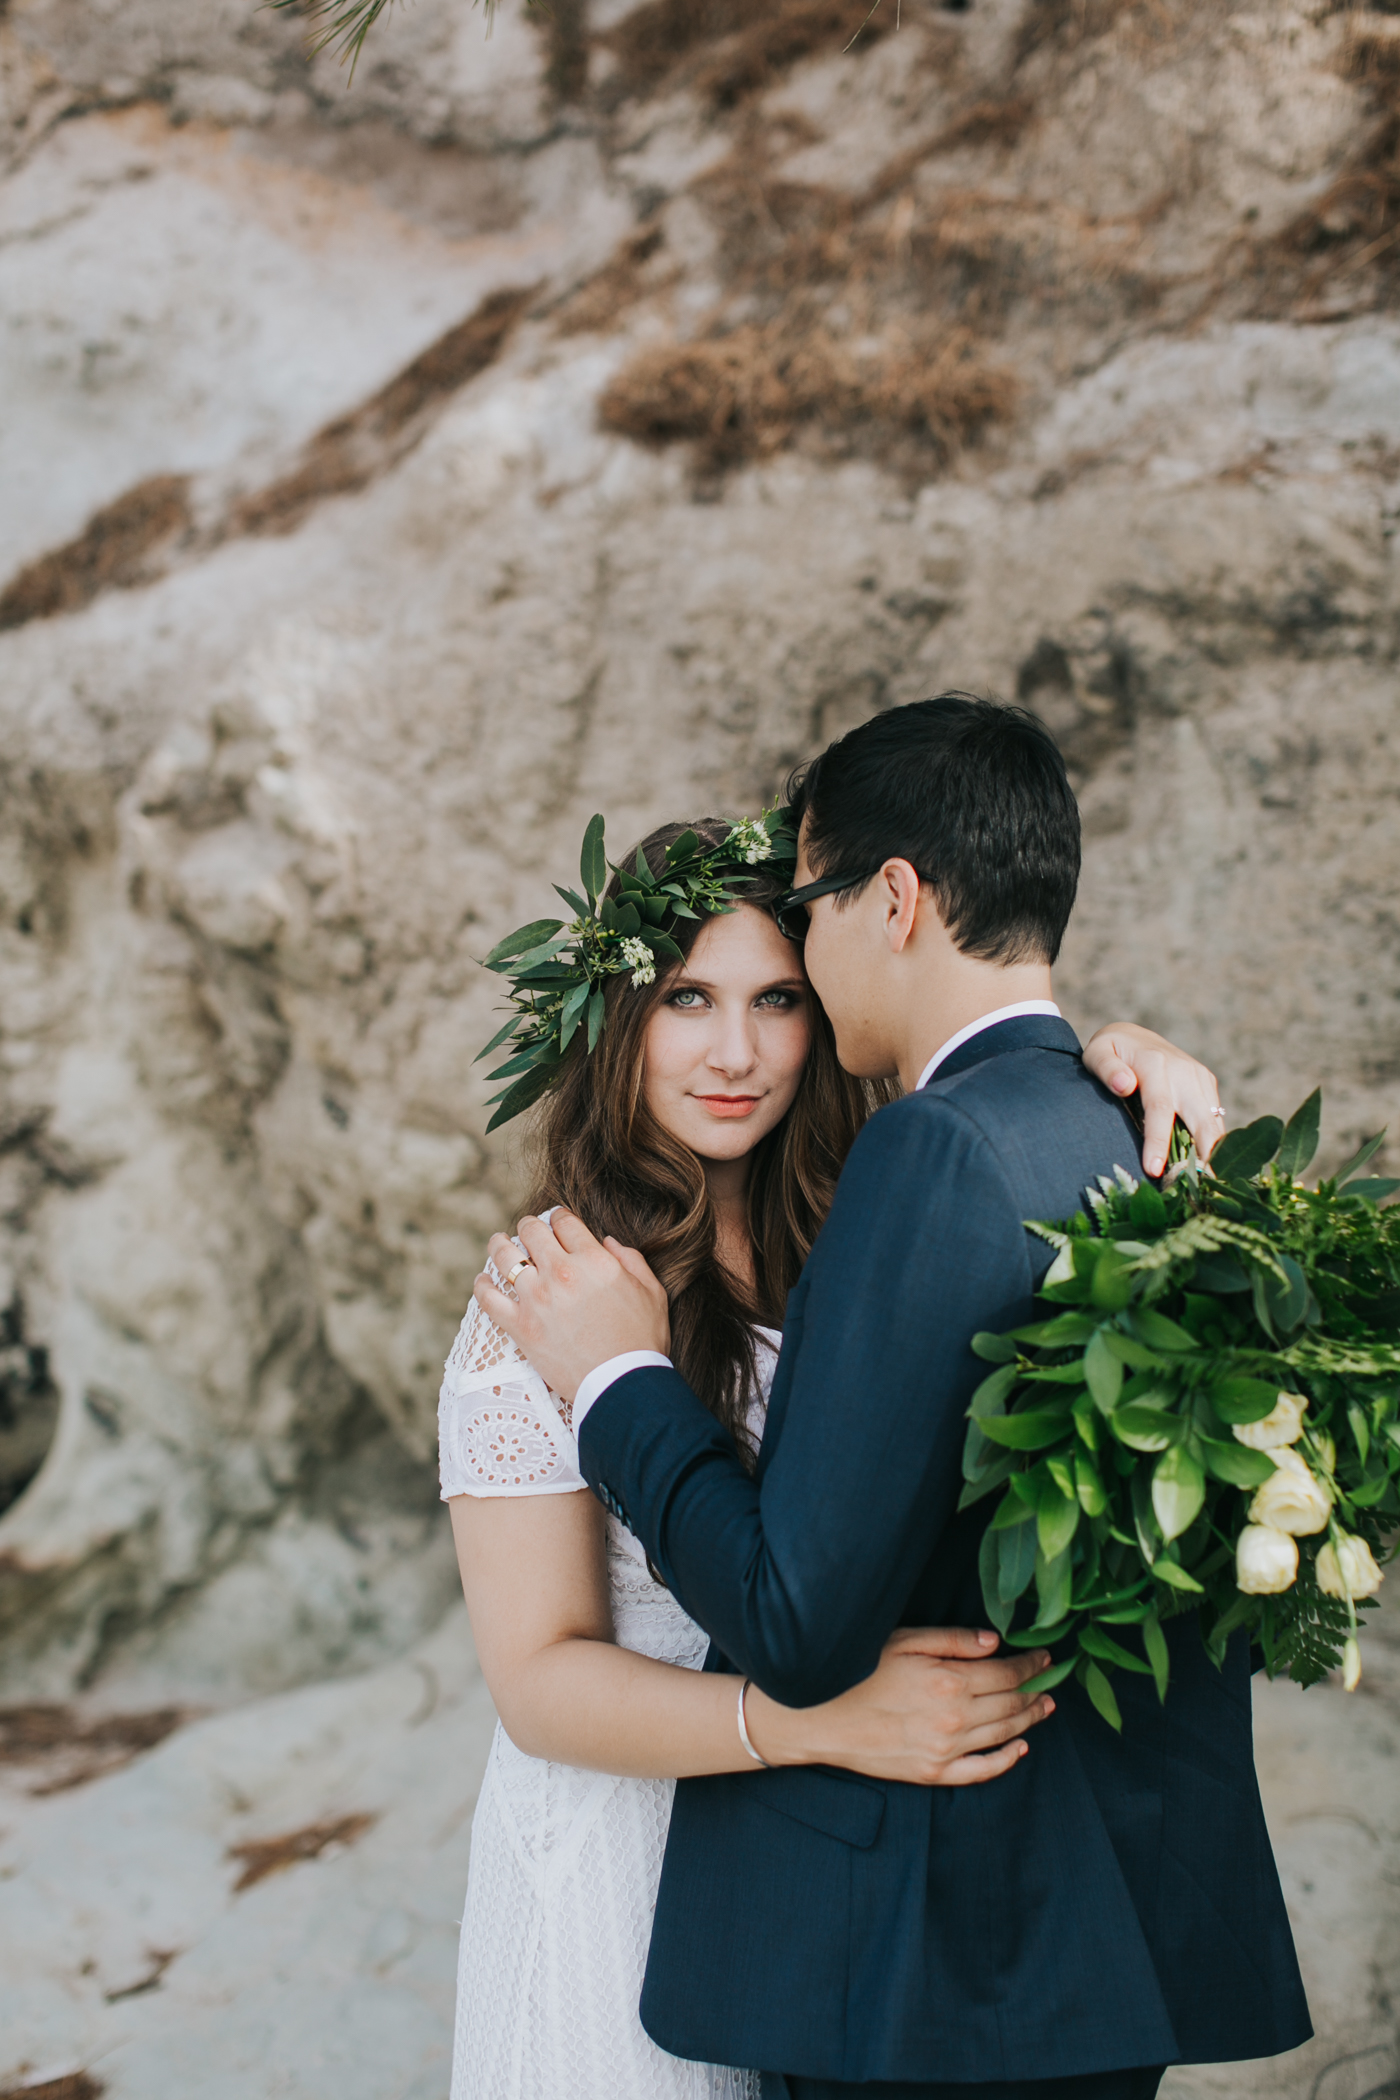 Ariana & Tim - Dunedin, New Zealand Wedding - Destination Wedding - Samantha Heather Photography-148.jpg